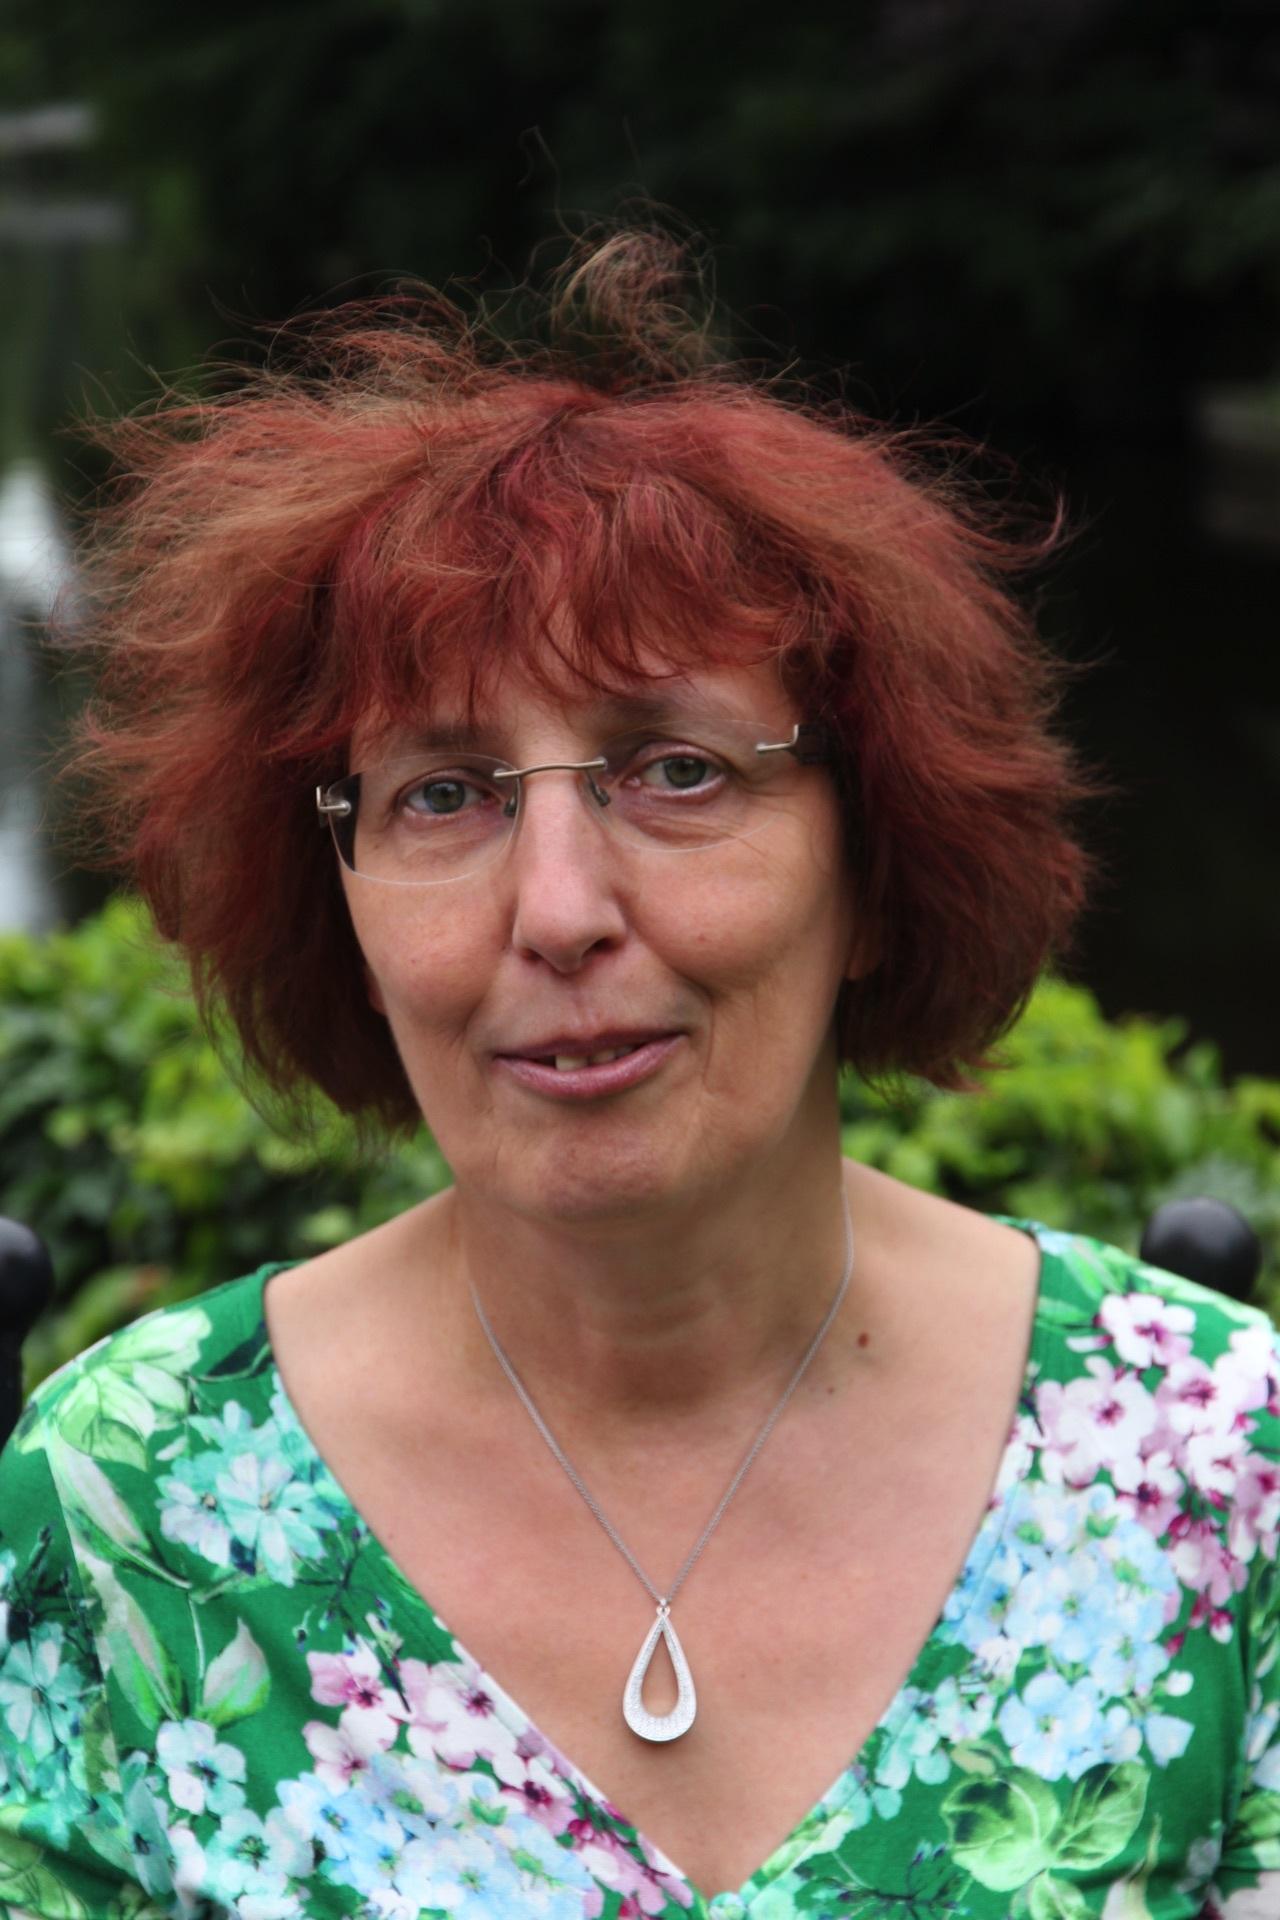 Ingrid Czerlikowski